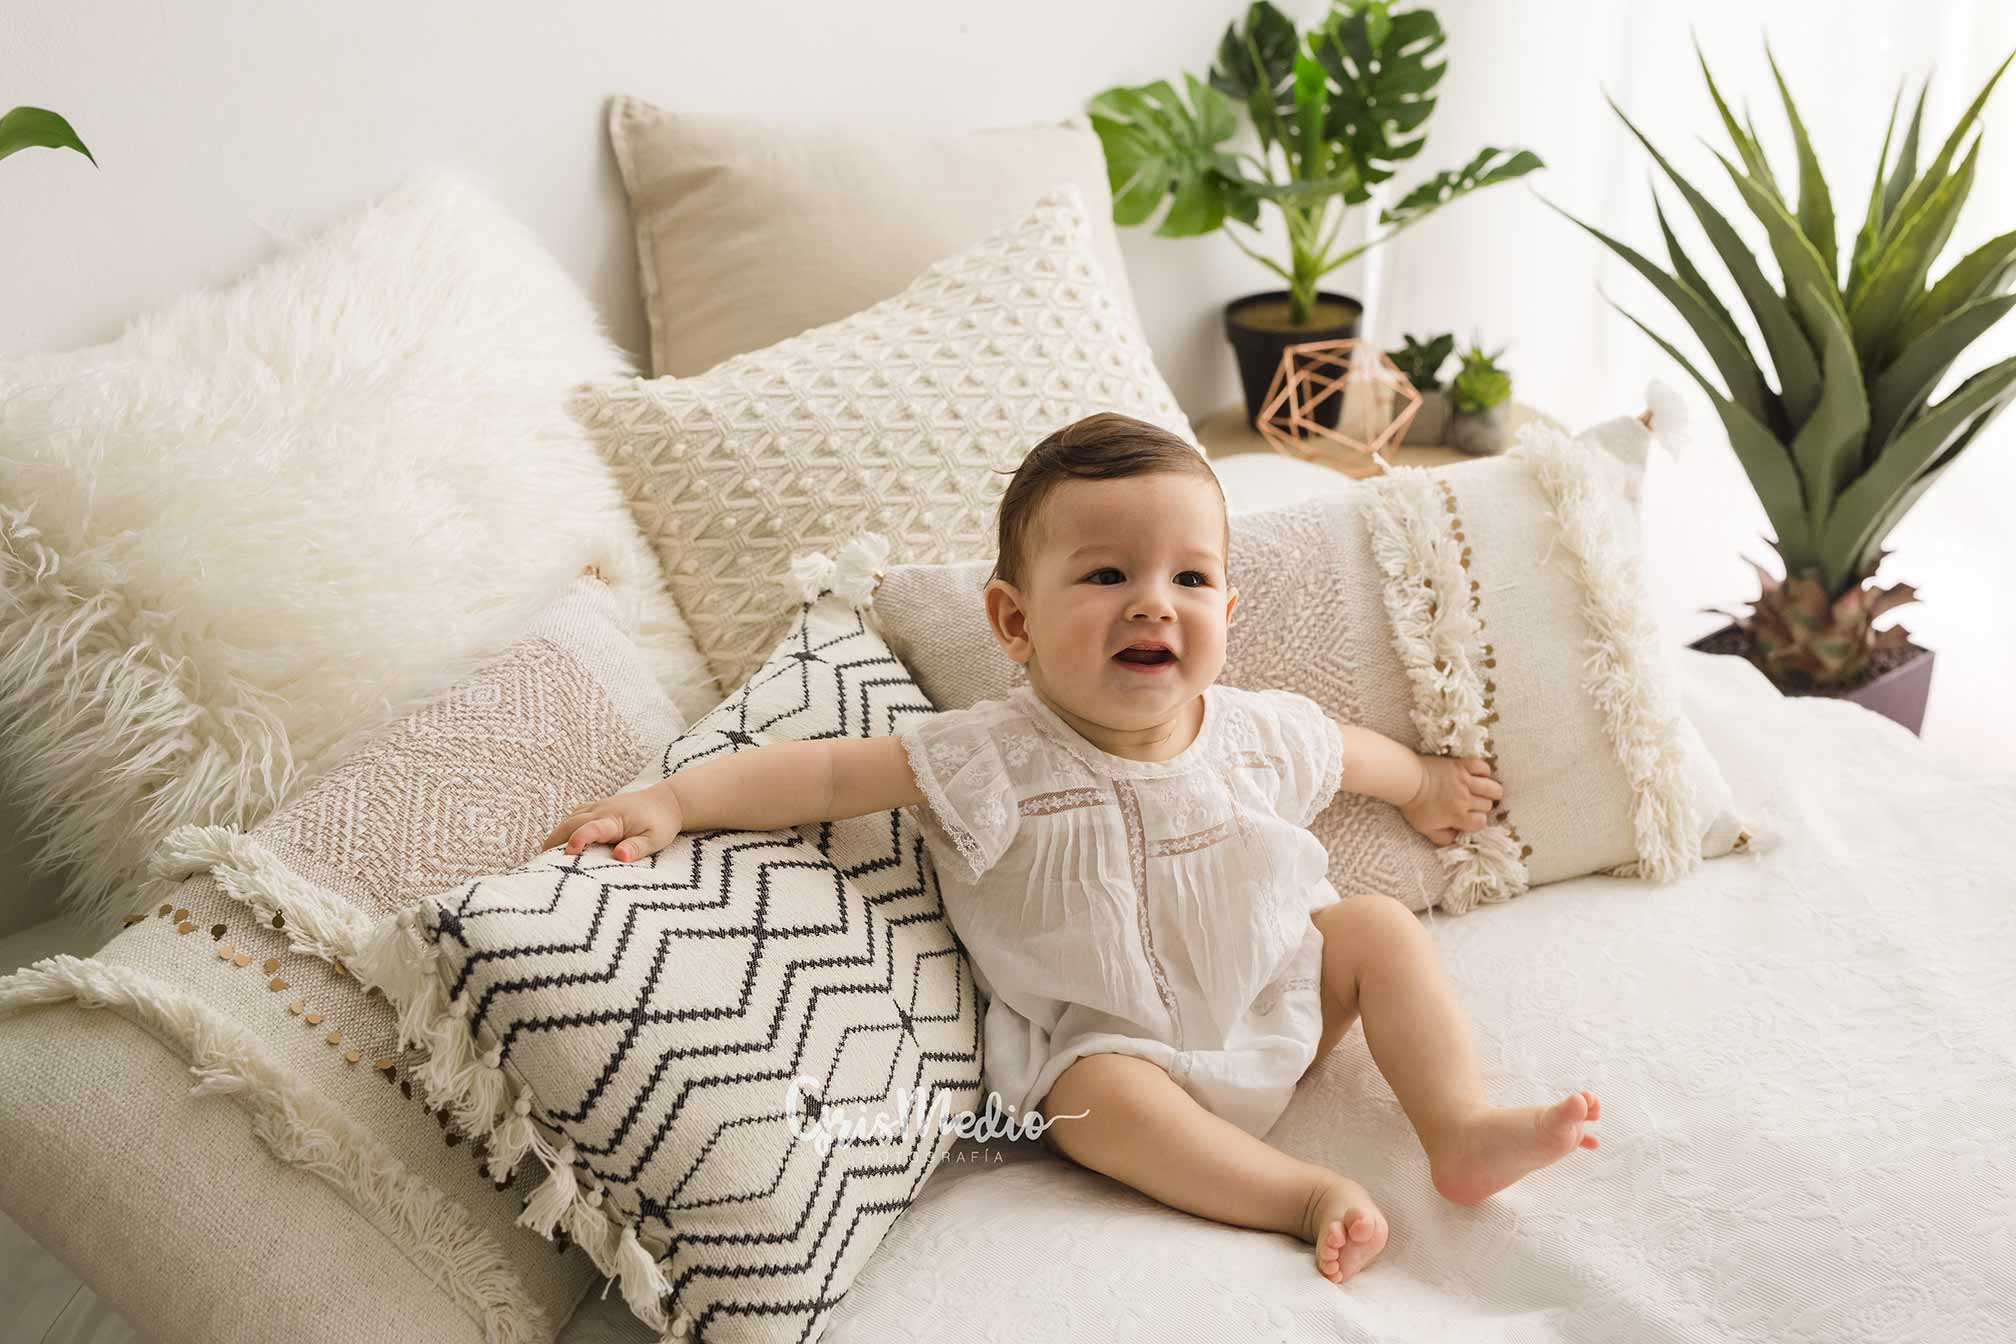 fotografia-familia-infantil-zaragoza-grismedio-bebe-lactancia9